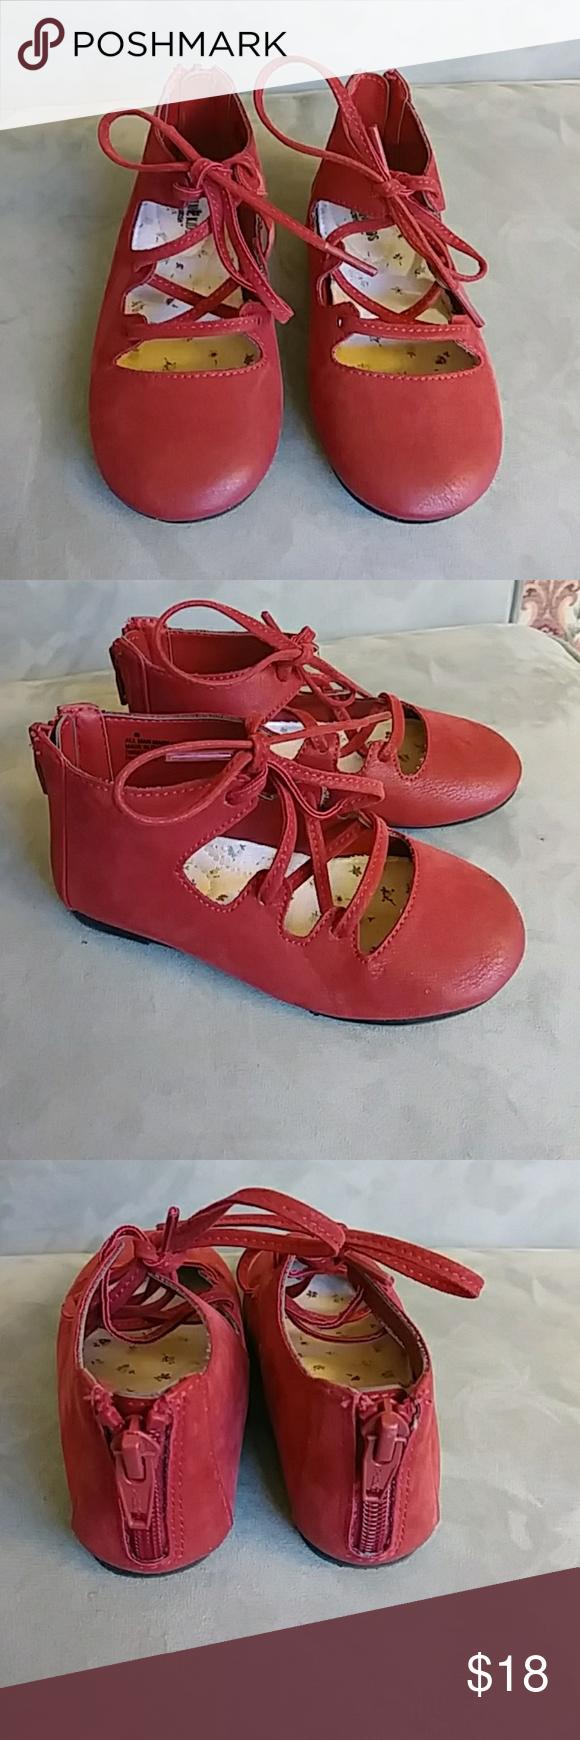 Pink dress shoes for ladies  Oshkosh Christmas Red Toddler  Shoes  Red shoes Dress shoes and